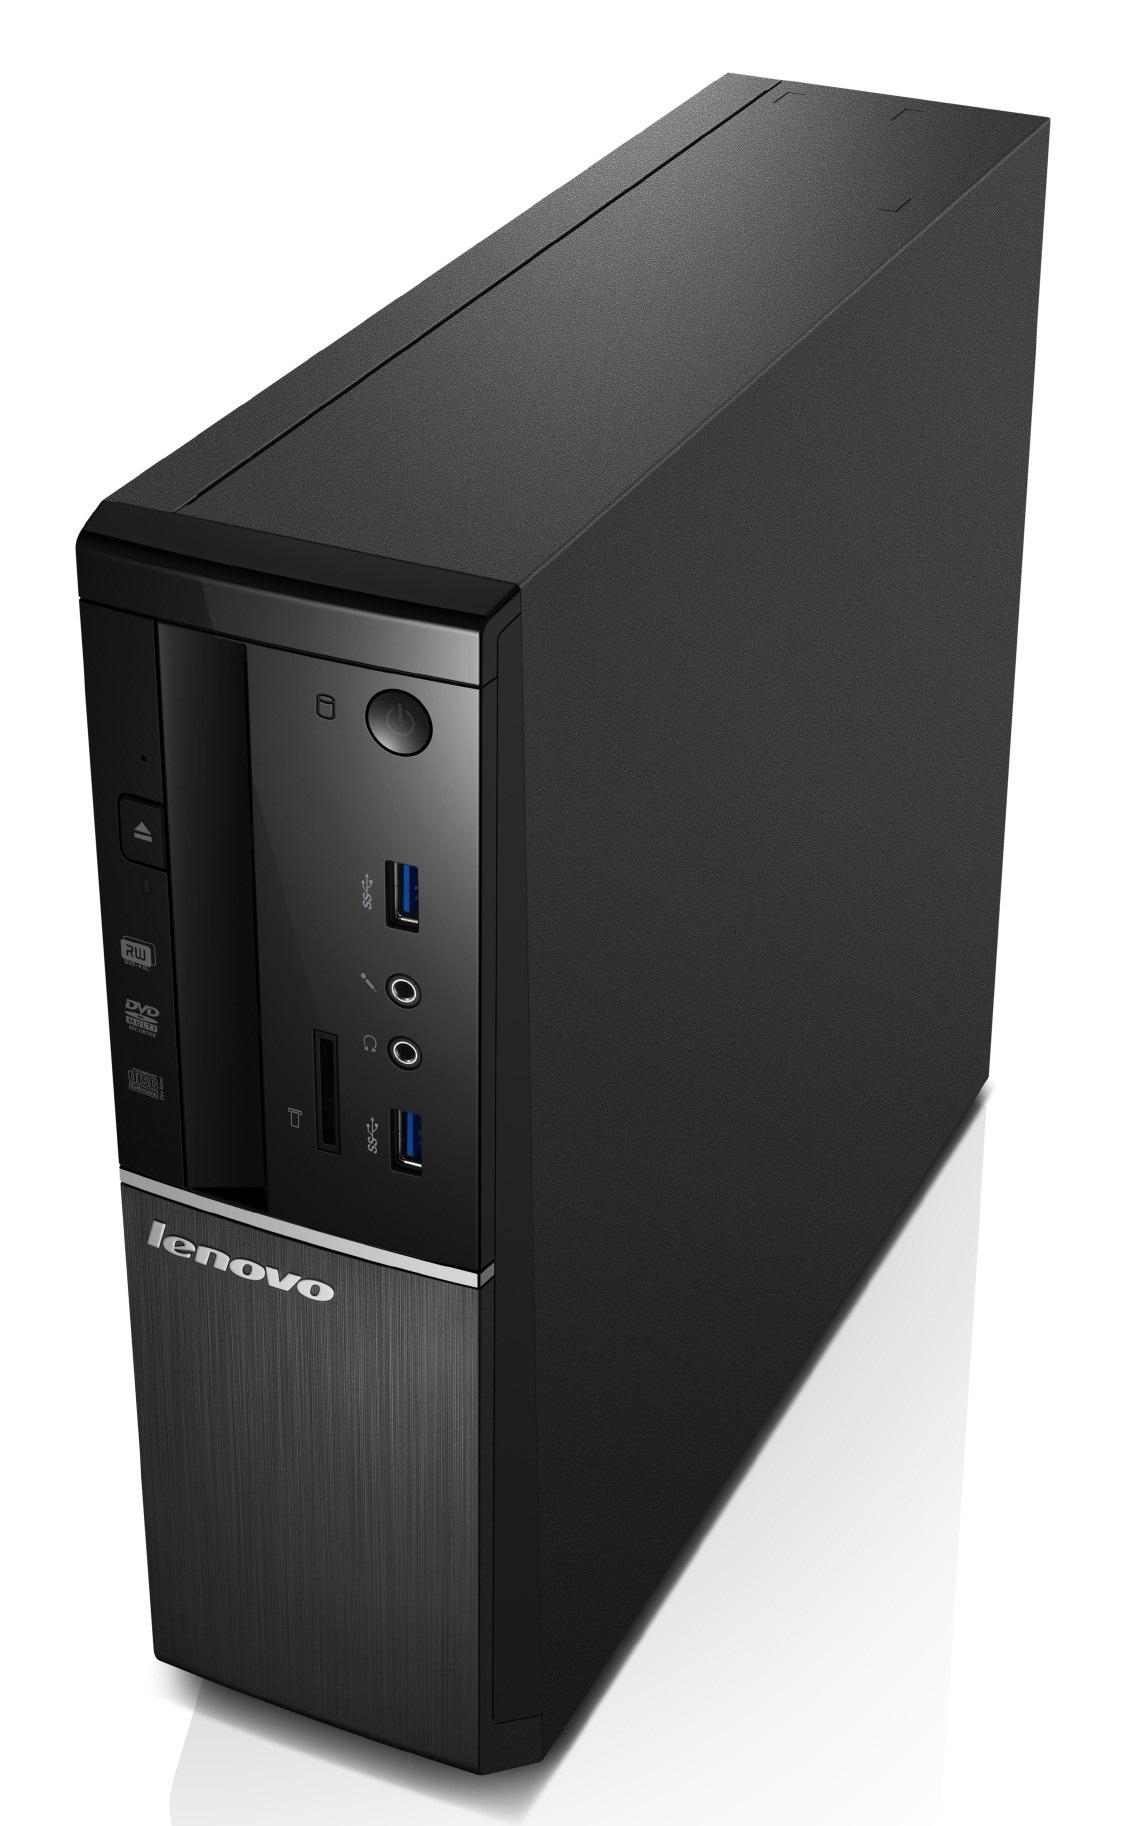 Lenovo IdeaCentre 510S-08IKL i5-7400 3,50GHz/8GB/SSD 128GB + HDD 1TB/DVD-RW/SFF/WIN10 90GB002KCK